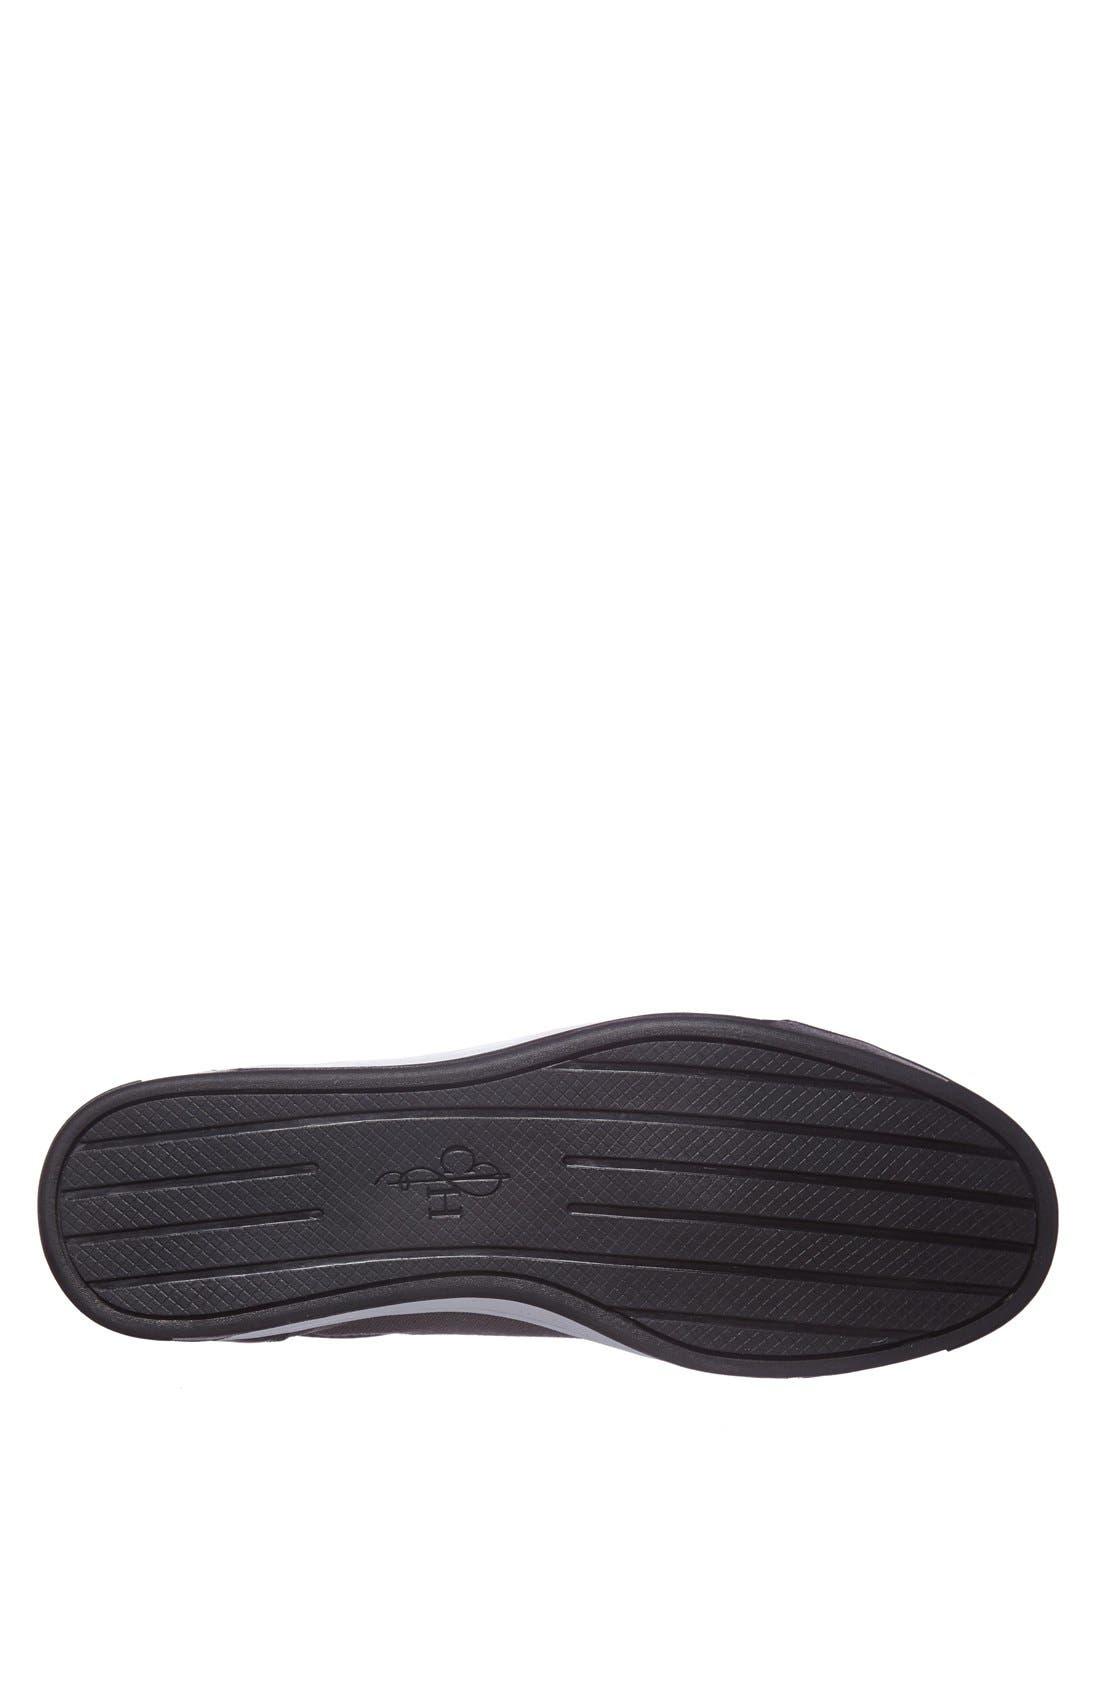 'Vartan Sport Oxford' Sneaker,                             Alternate thumbnail 22, color,